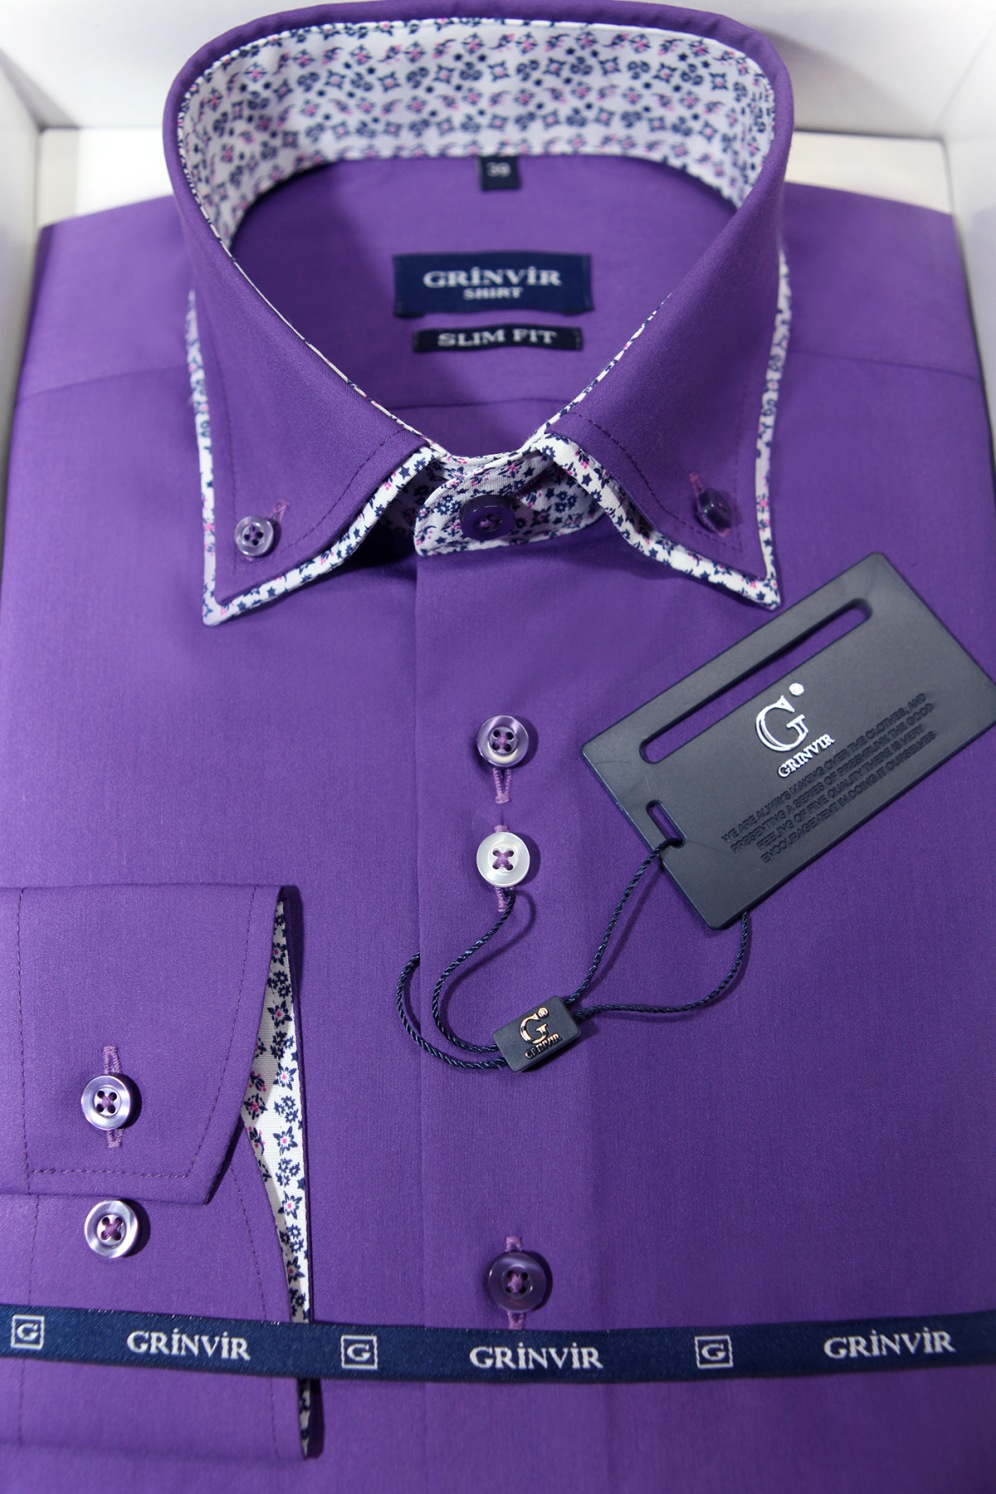 560ae192b724f79 Мужская рубашка Пижон New с двойным воротником